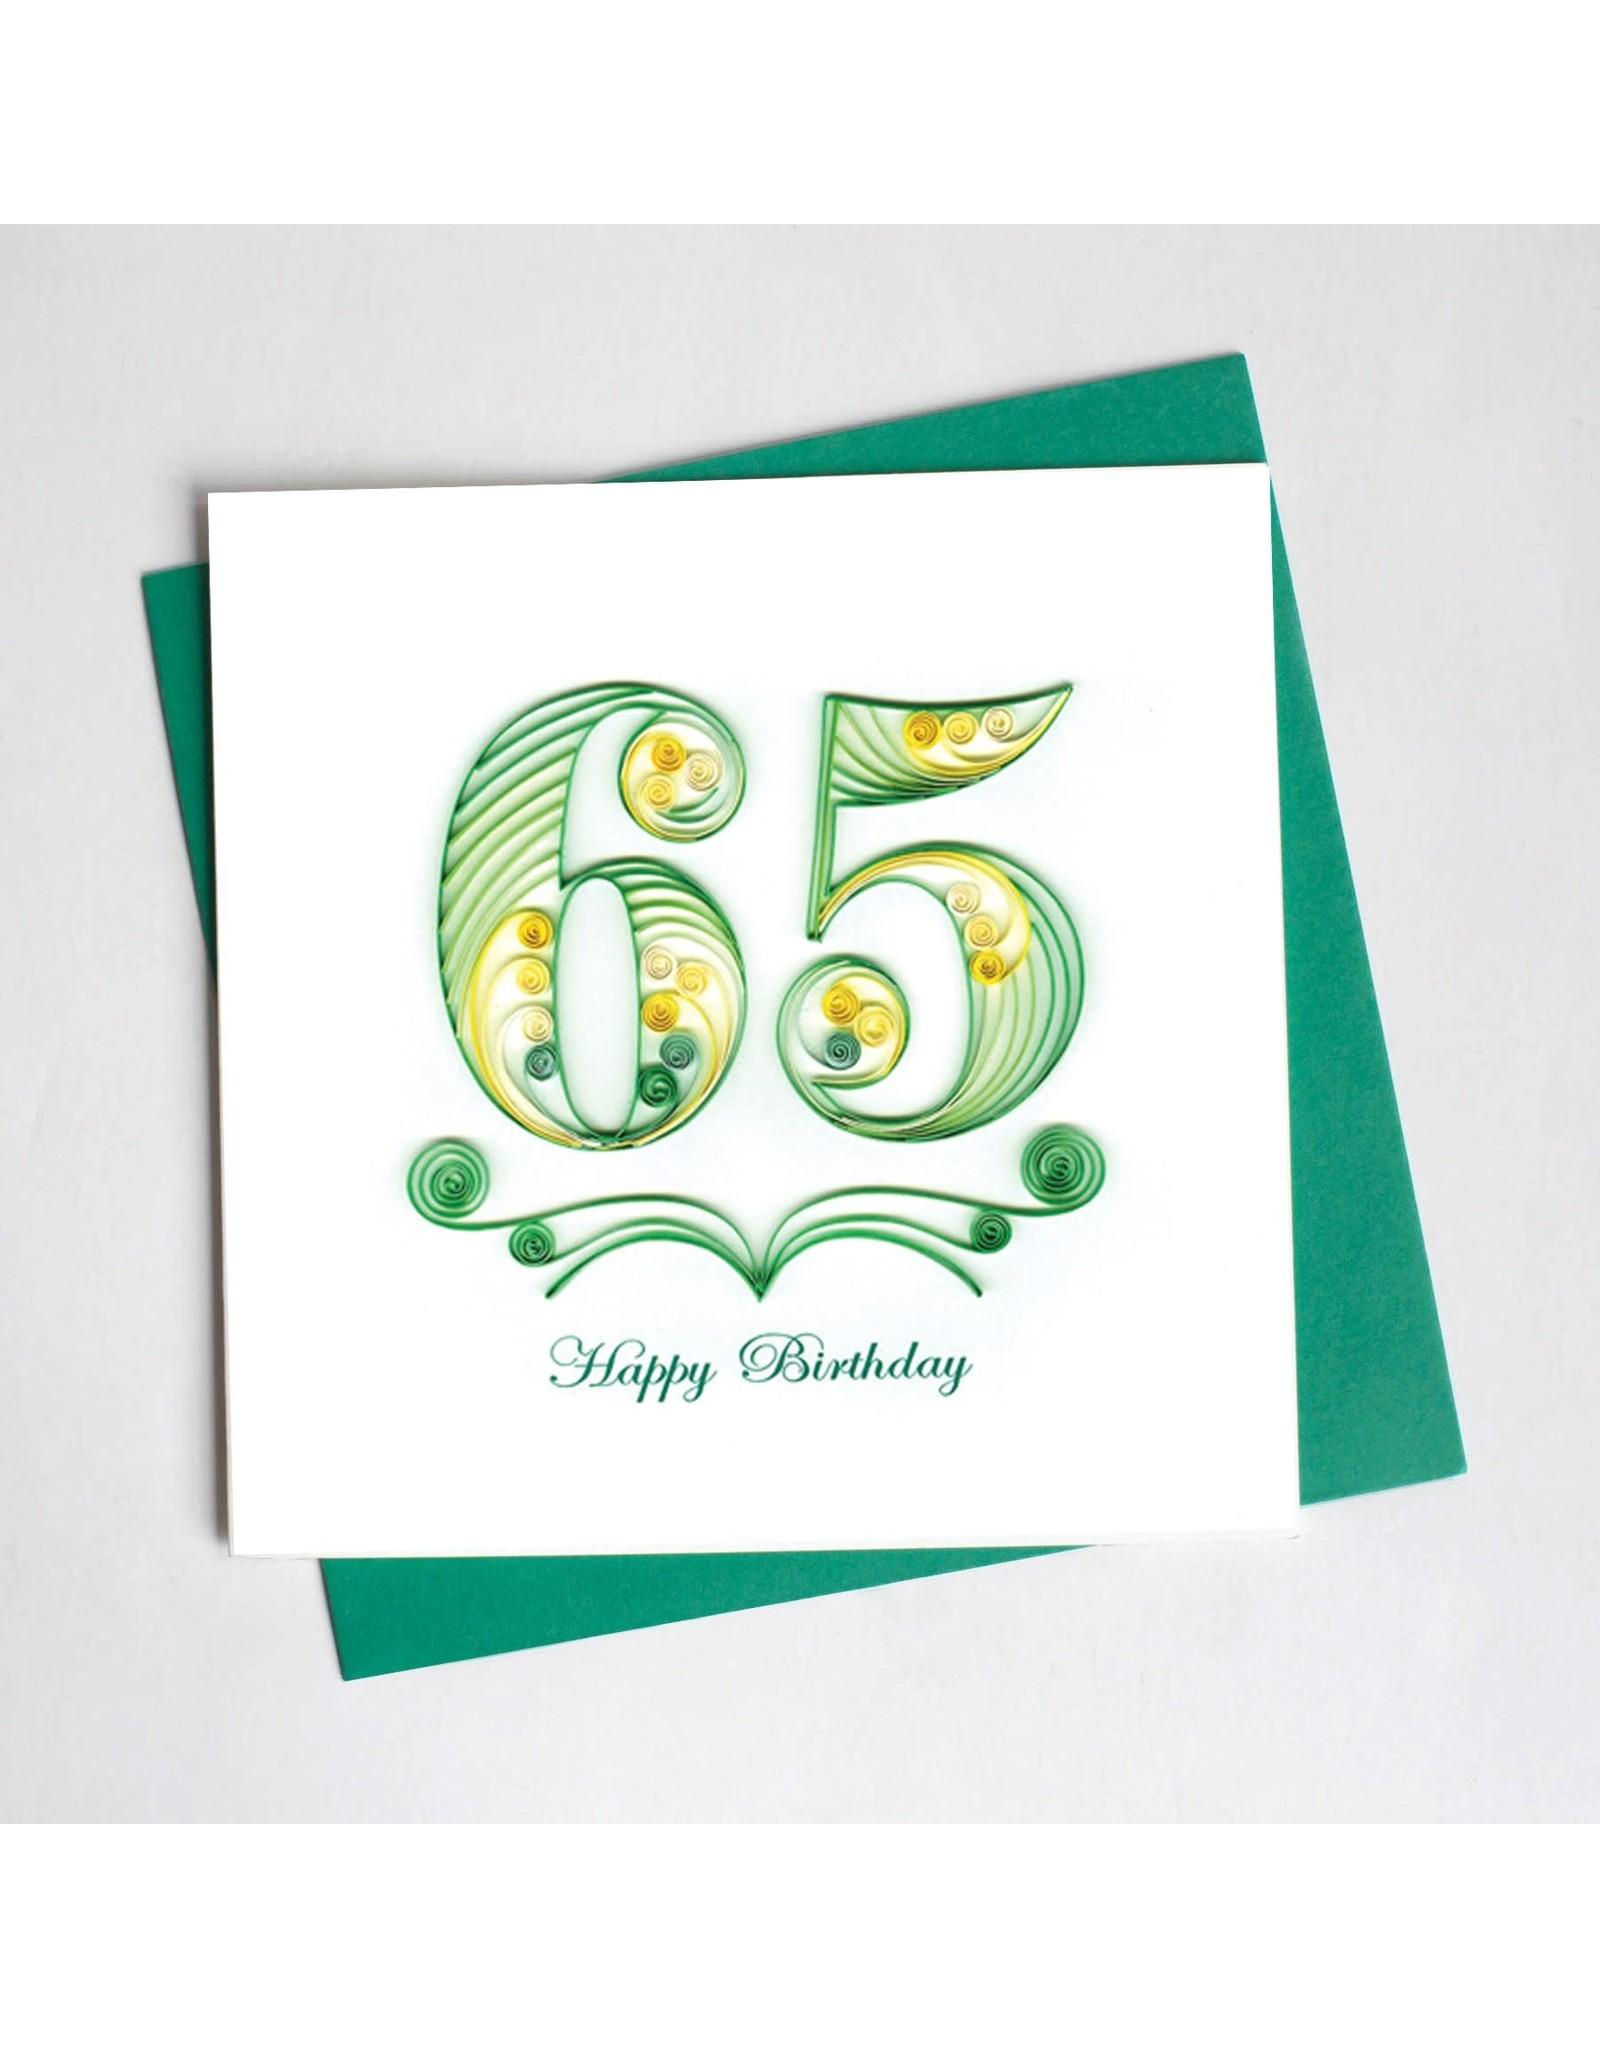 65th Birthday, Quilling Card, Vietnam